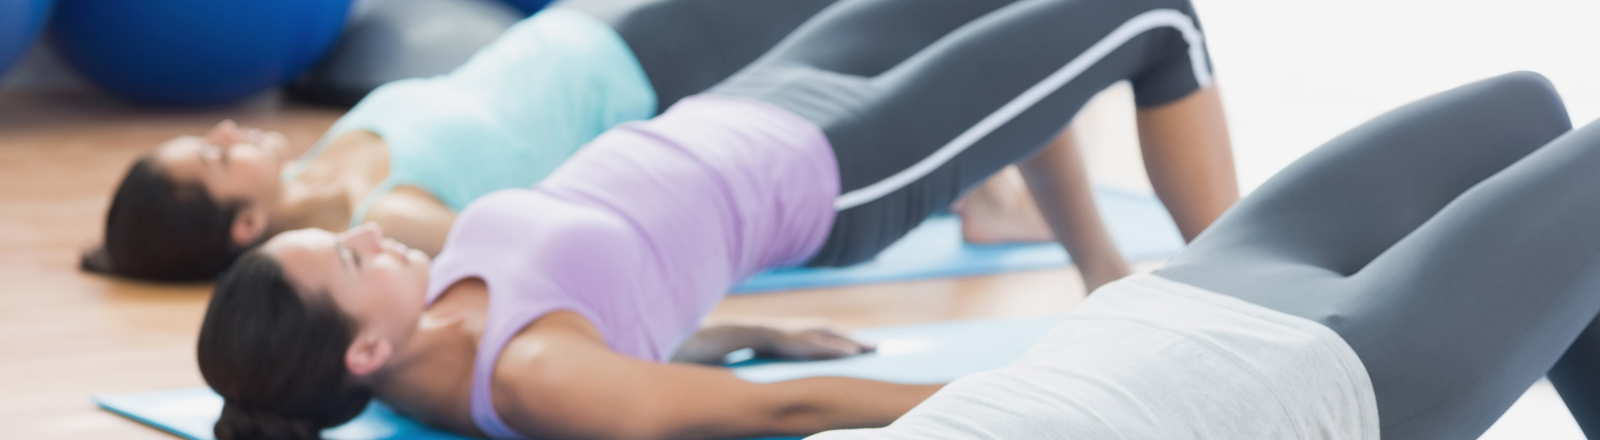 pilates terapéutico Madrid